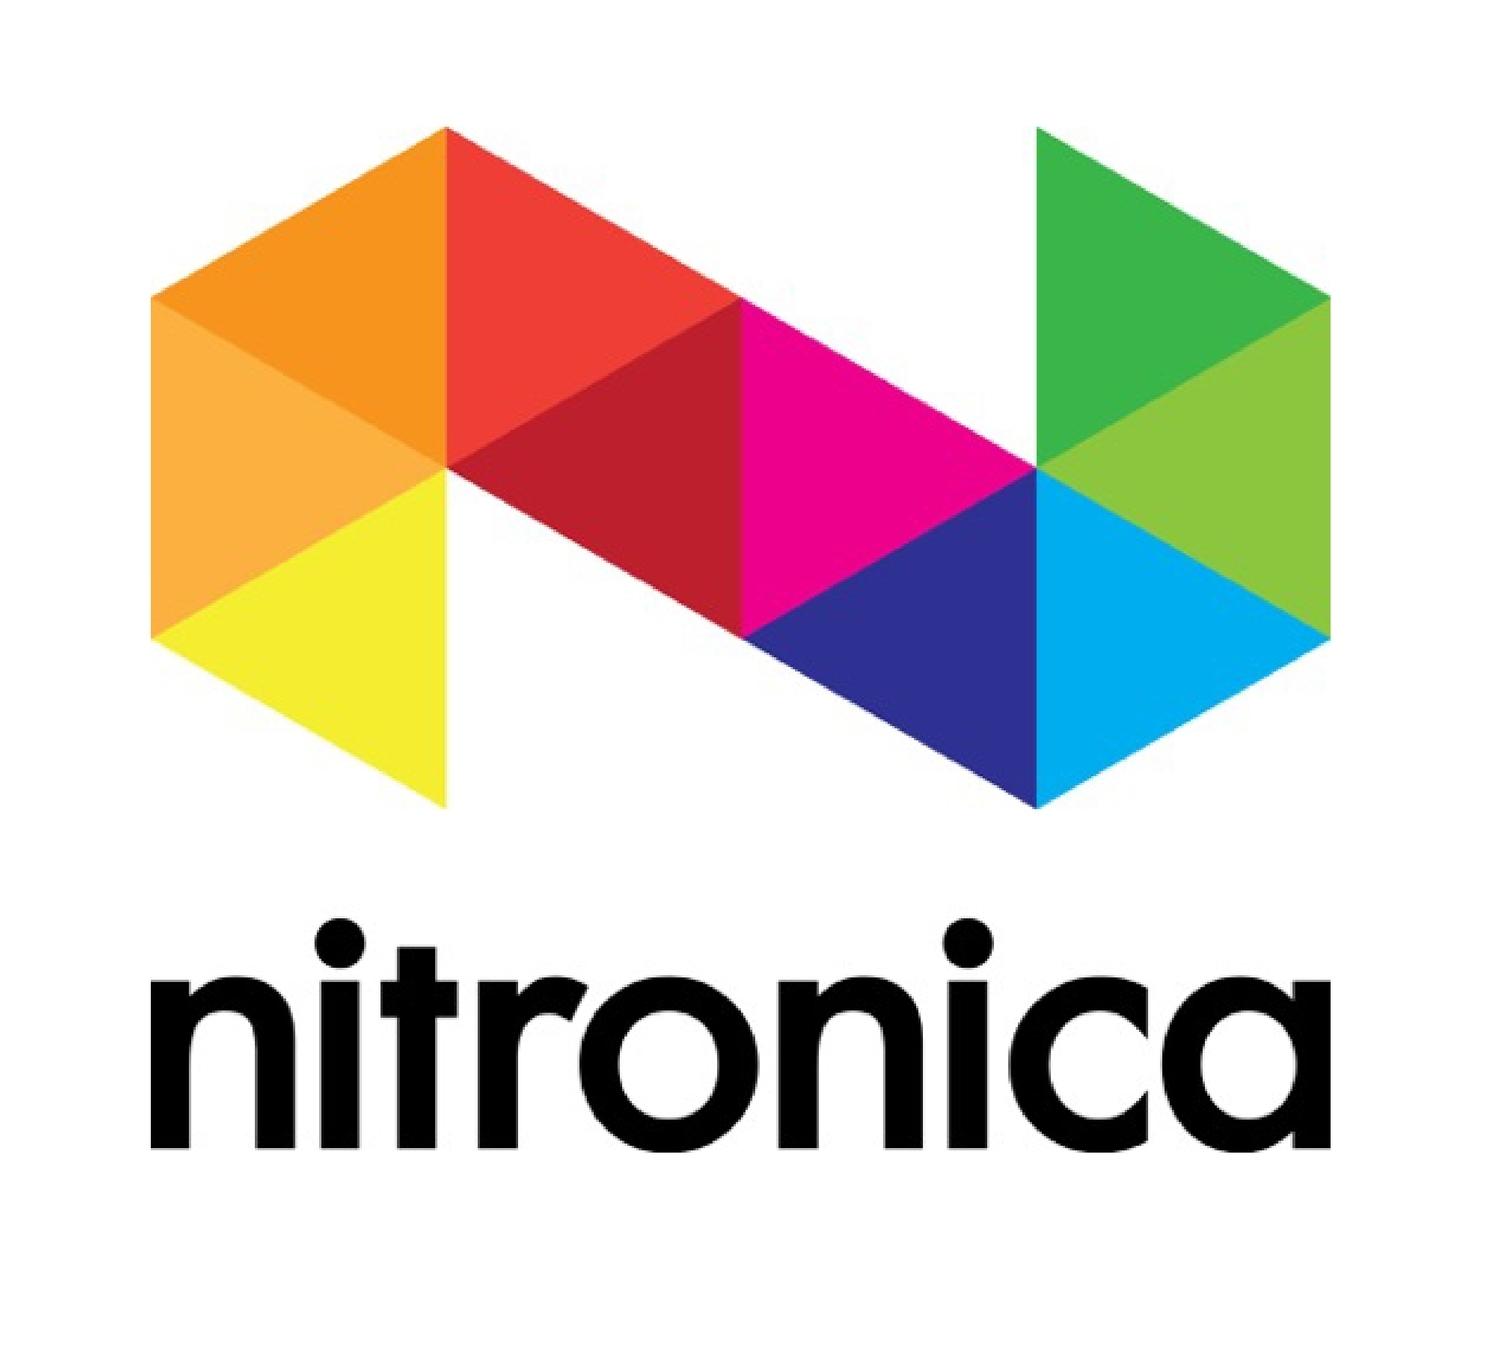 Nitronica_Logo_black-01.jpg